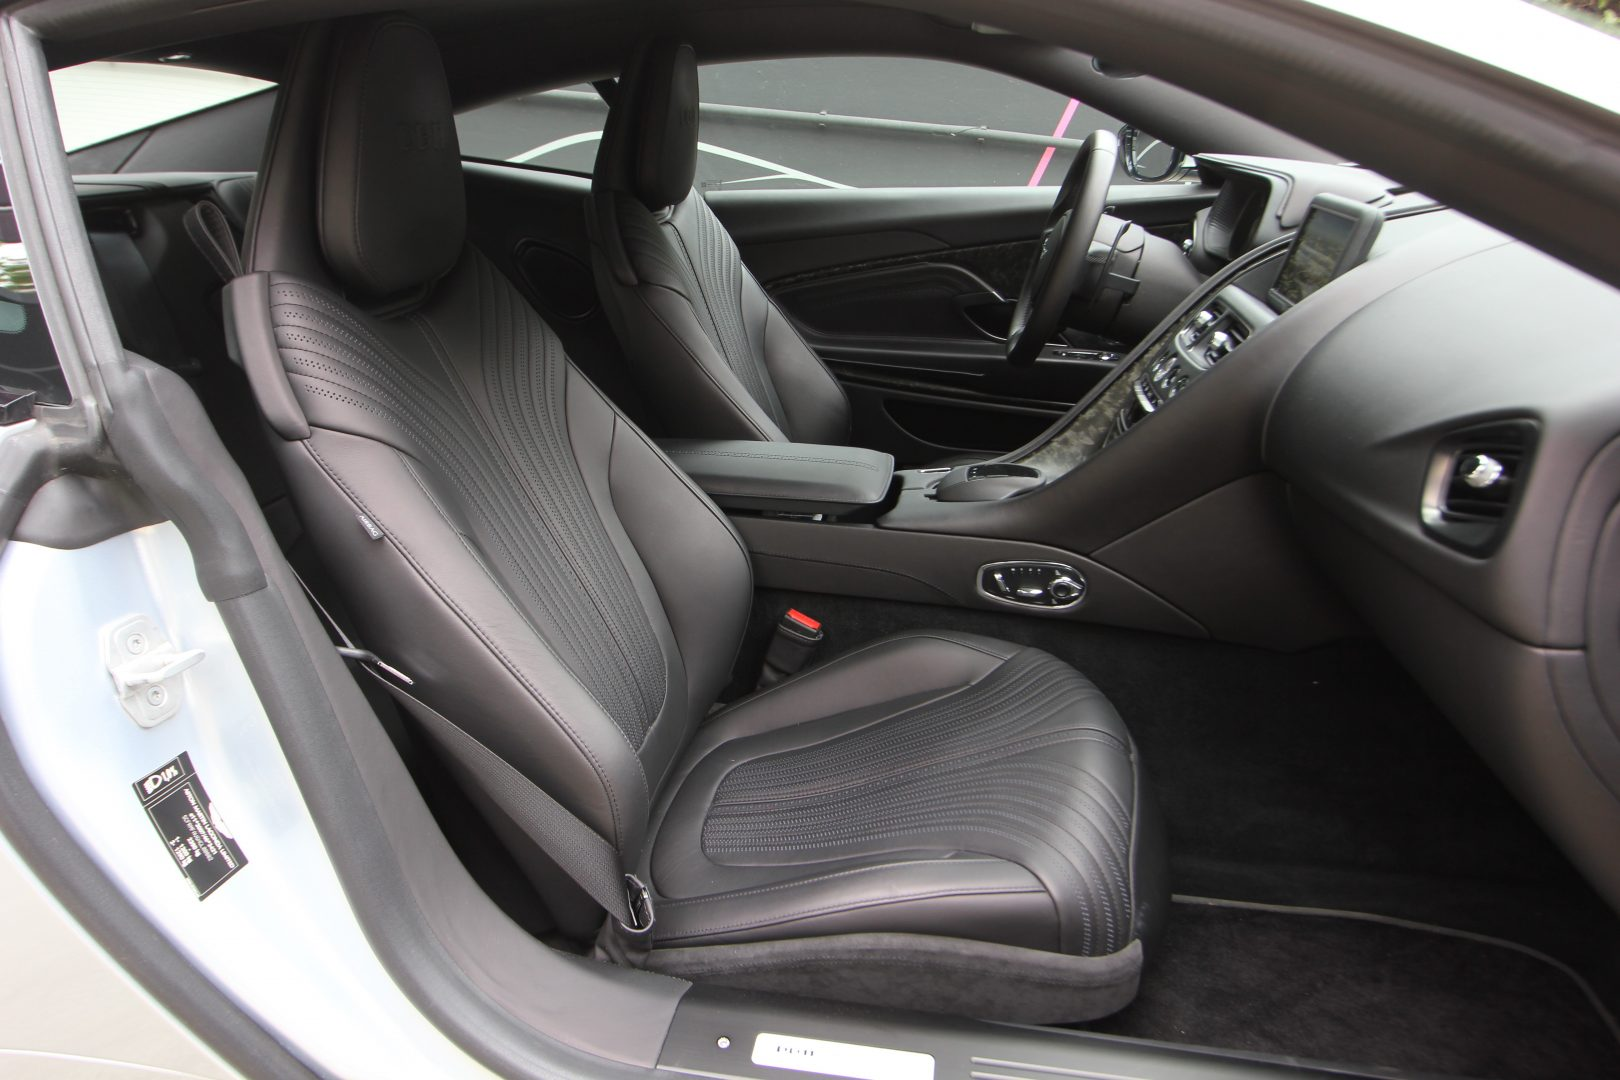 AIL Aston Martin DB11 Coupe 5.2 V12 7